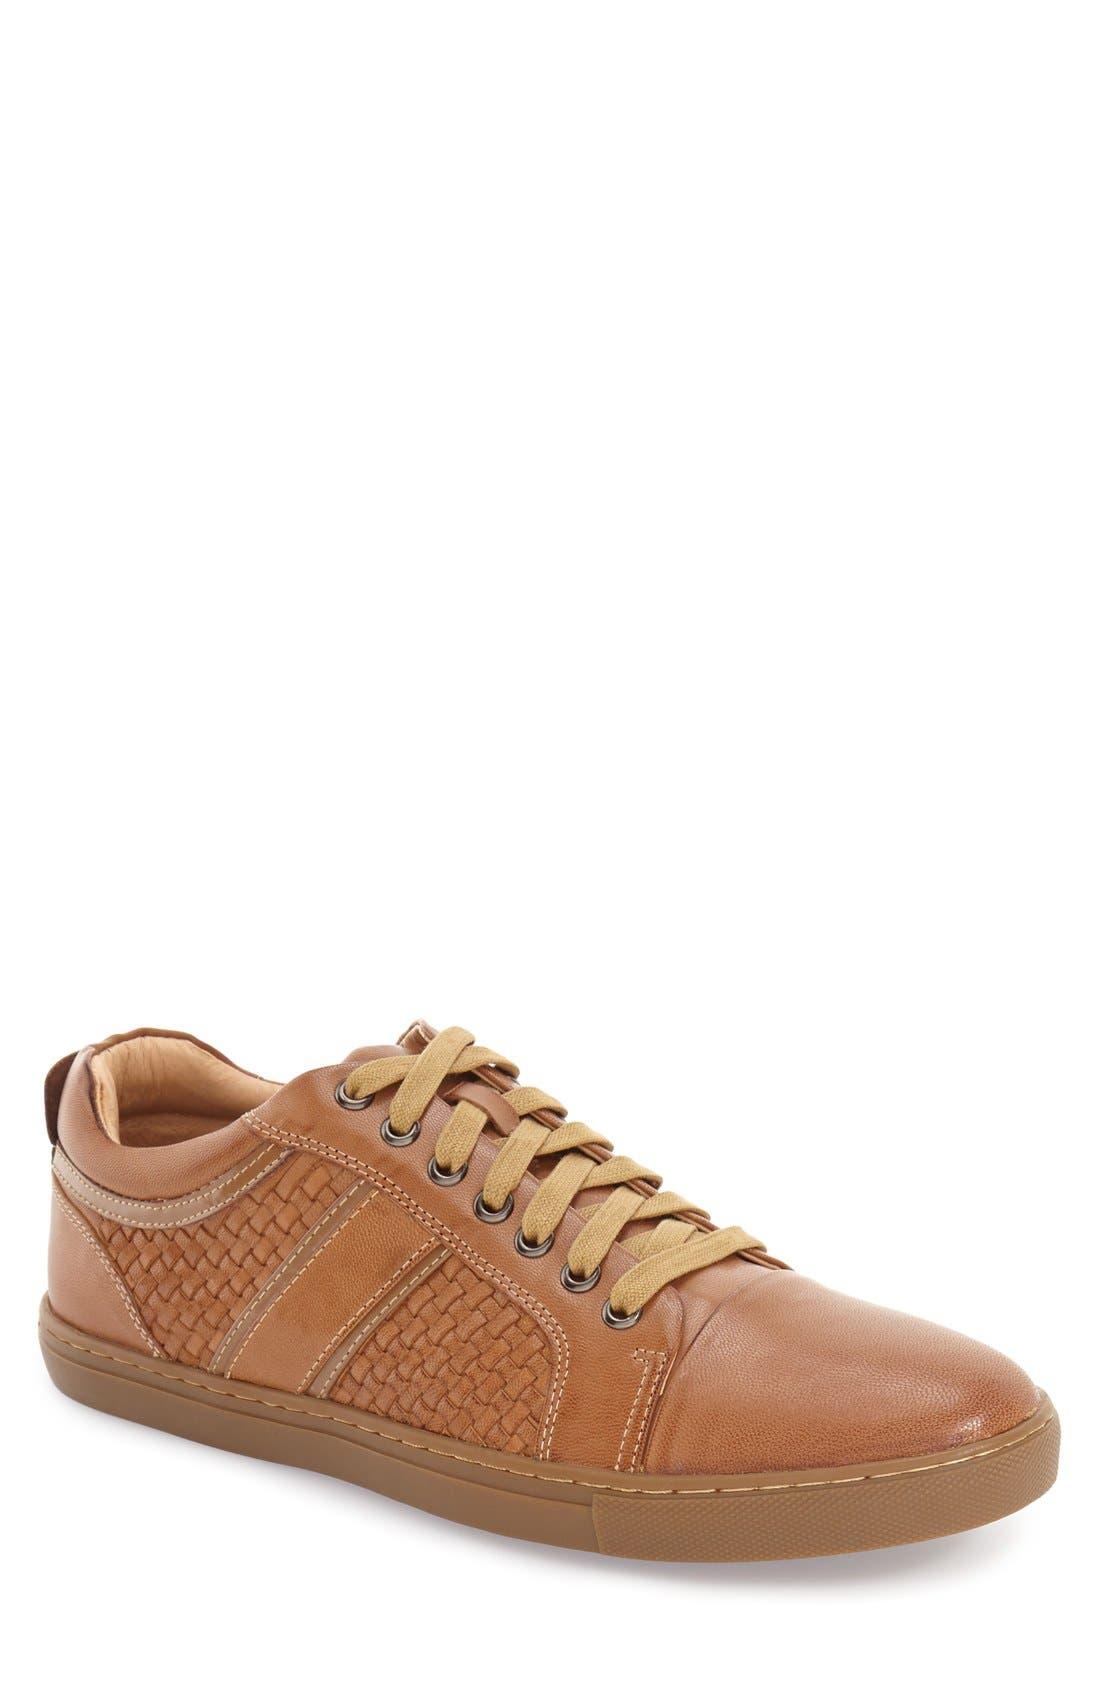 Alternate Image 1 Selected - Zanzara 'Speed' Sneaker (Men)